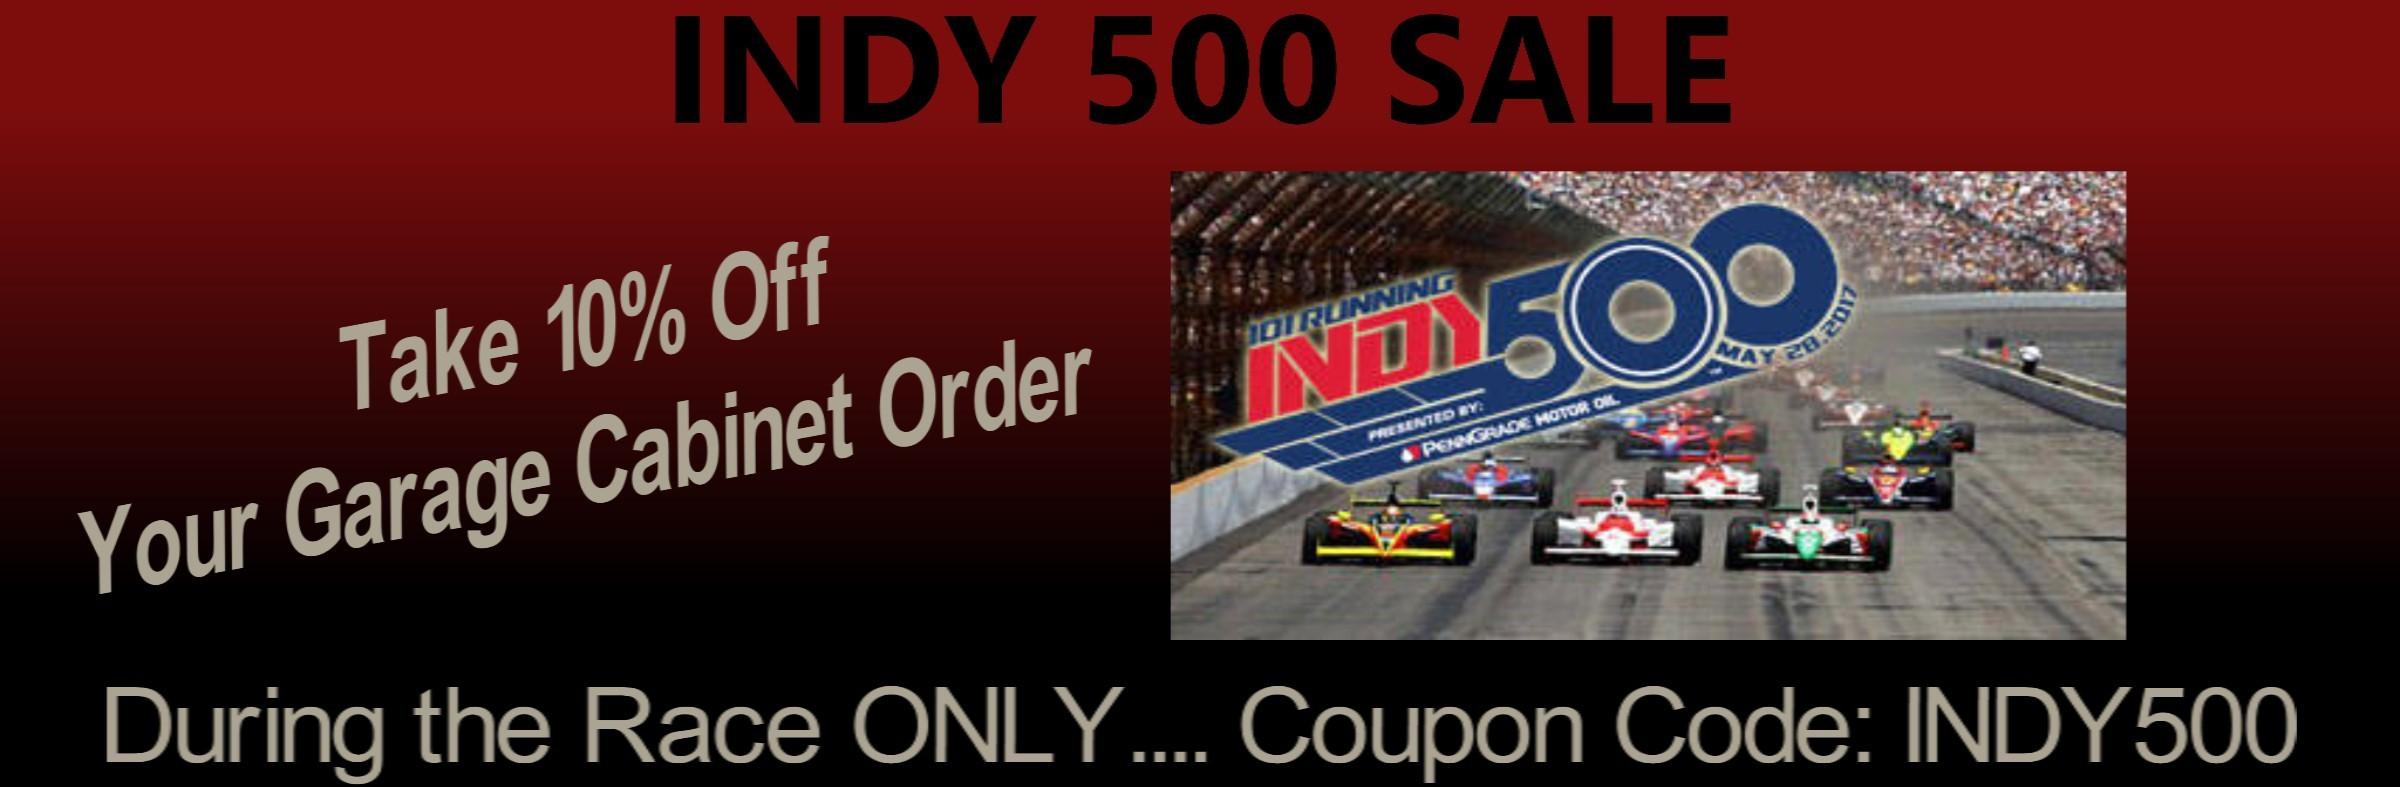 indy-500-sale.jpg